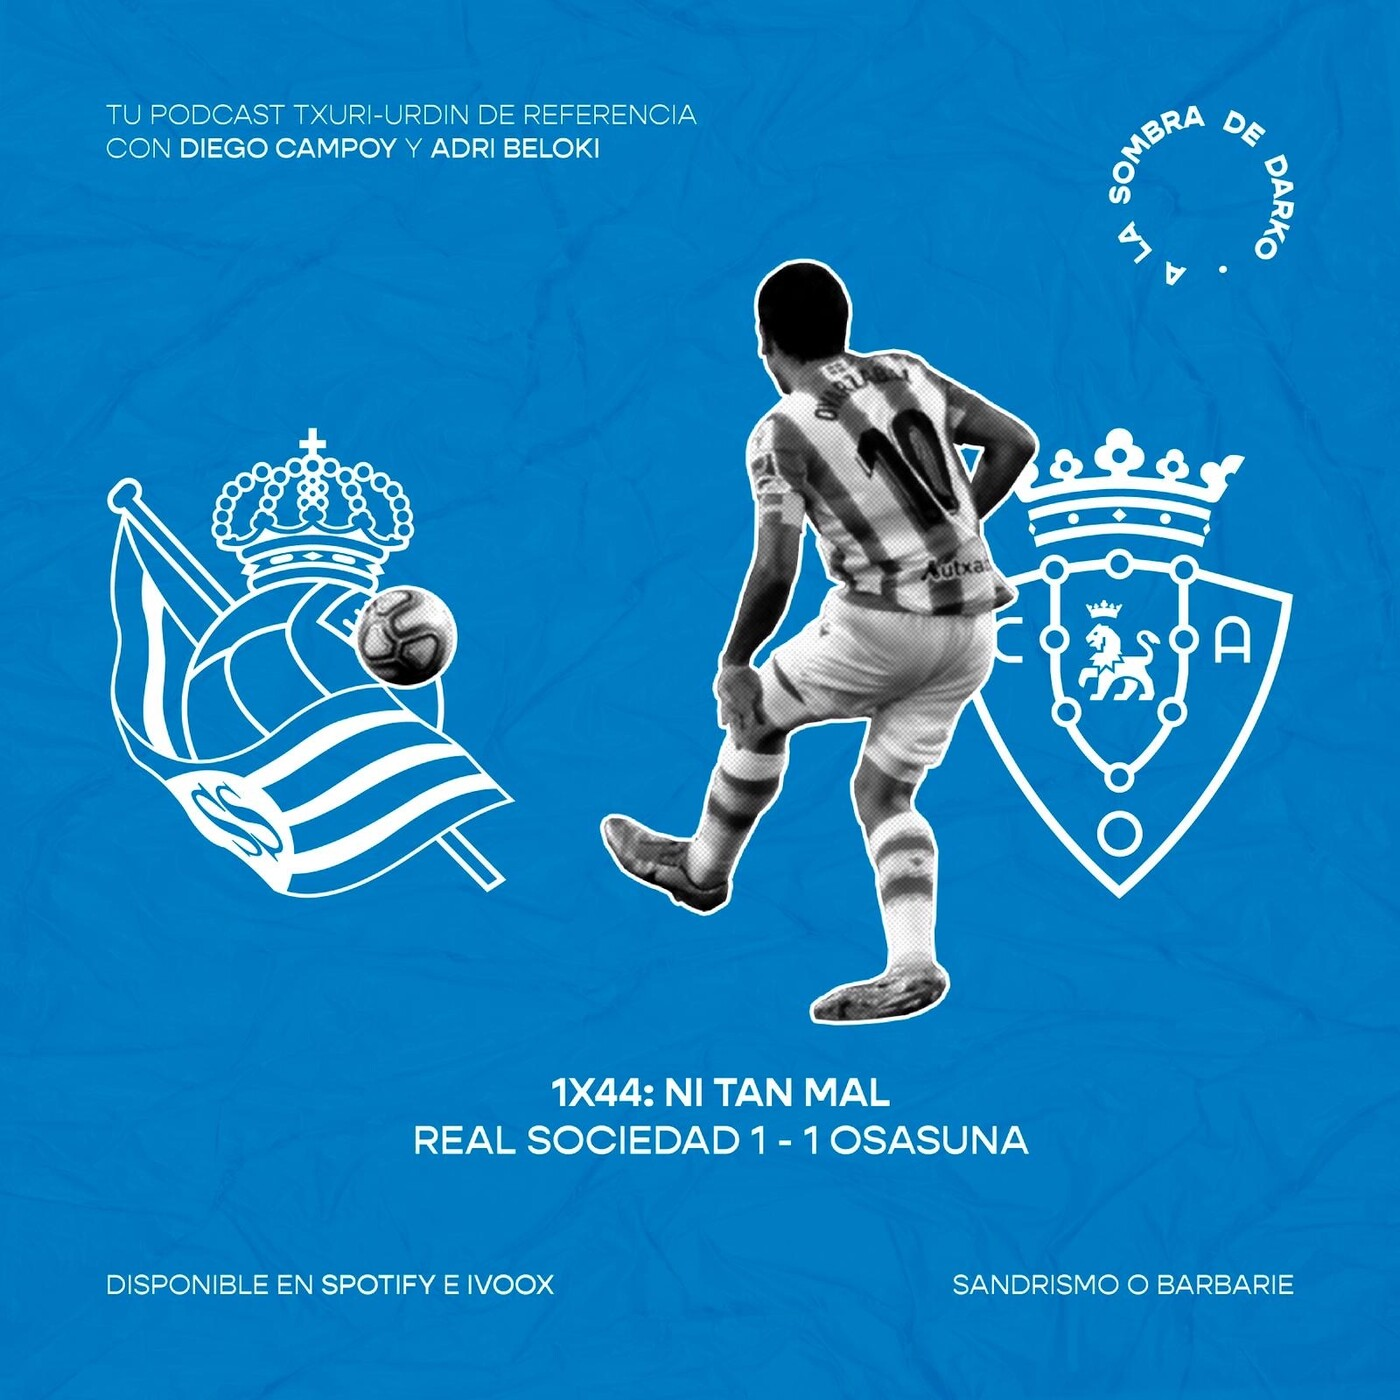 Real Sociedad 1-1 Osasuna: empate y ni tan mal | 1x44